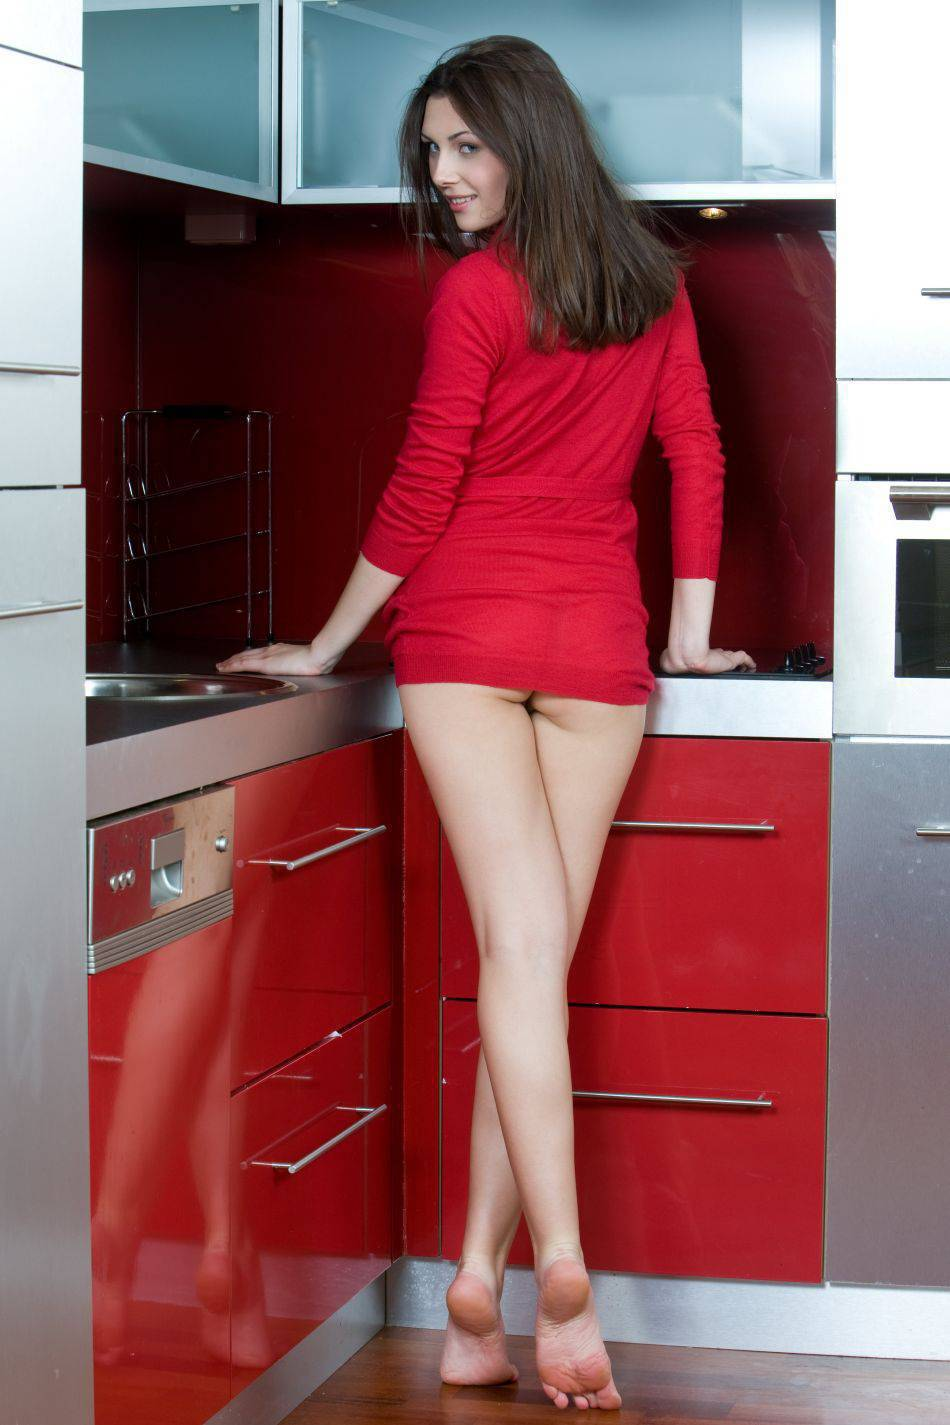 Соседка на кухне приподняла халатик фото 4 фотография